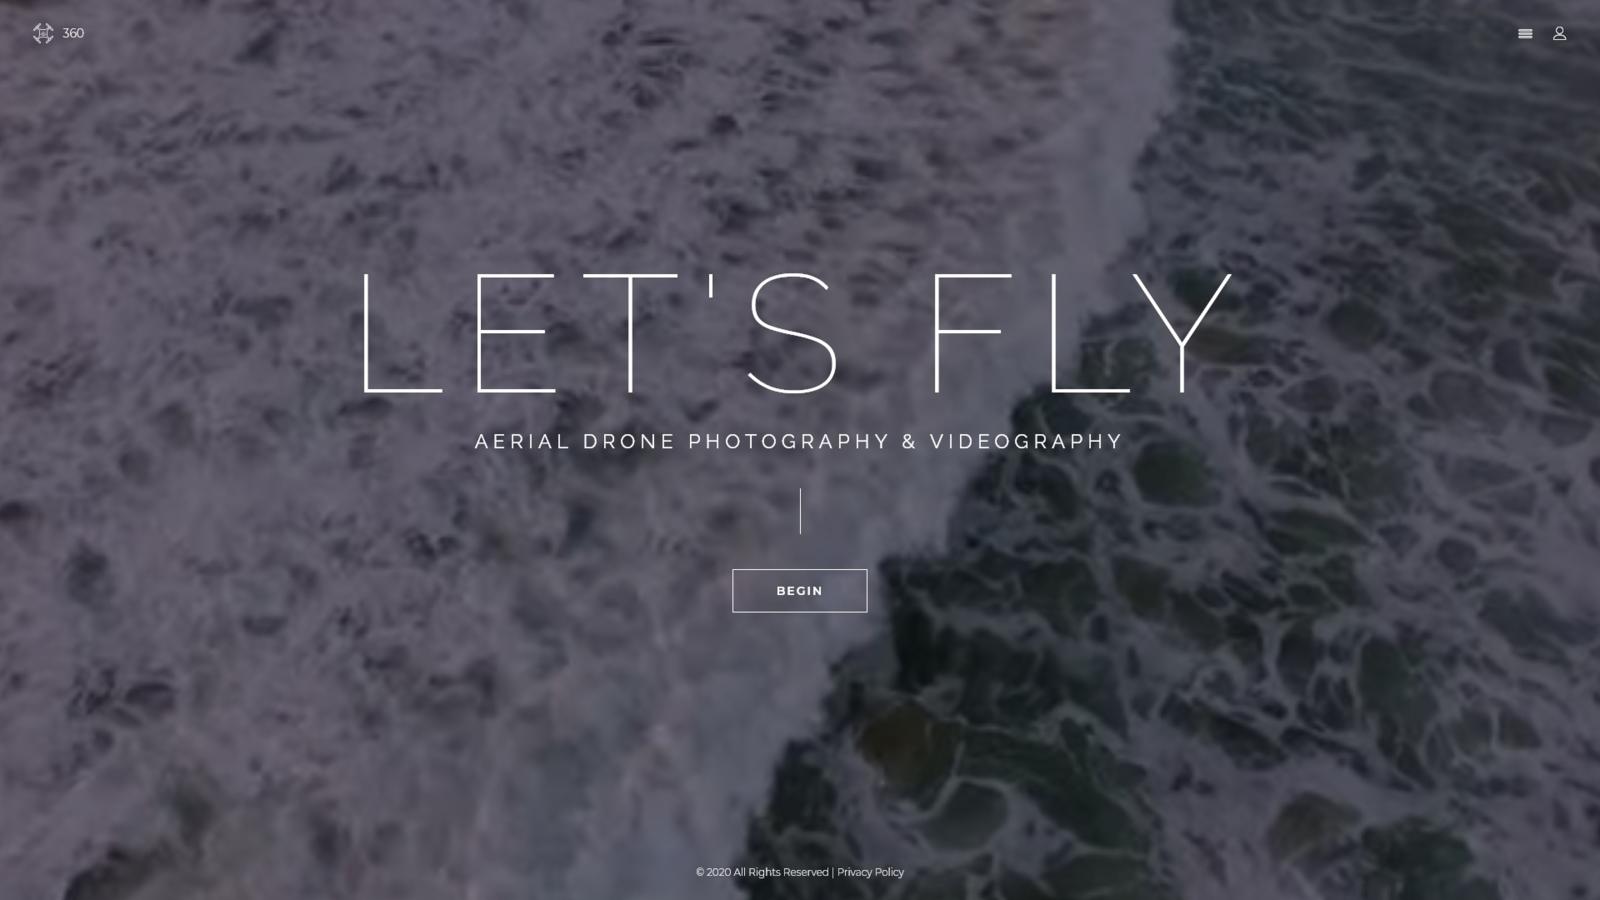 """Let's Fly - Aerial Photography & Videography"" - адаптивний Joomla шаблон №71634"